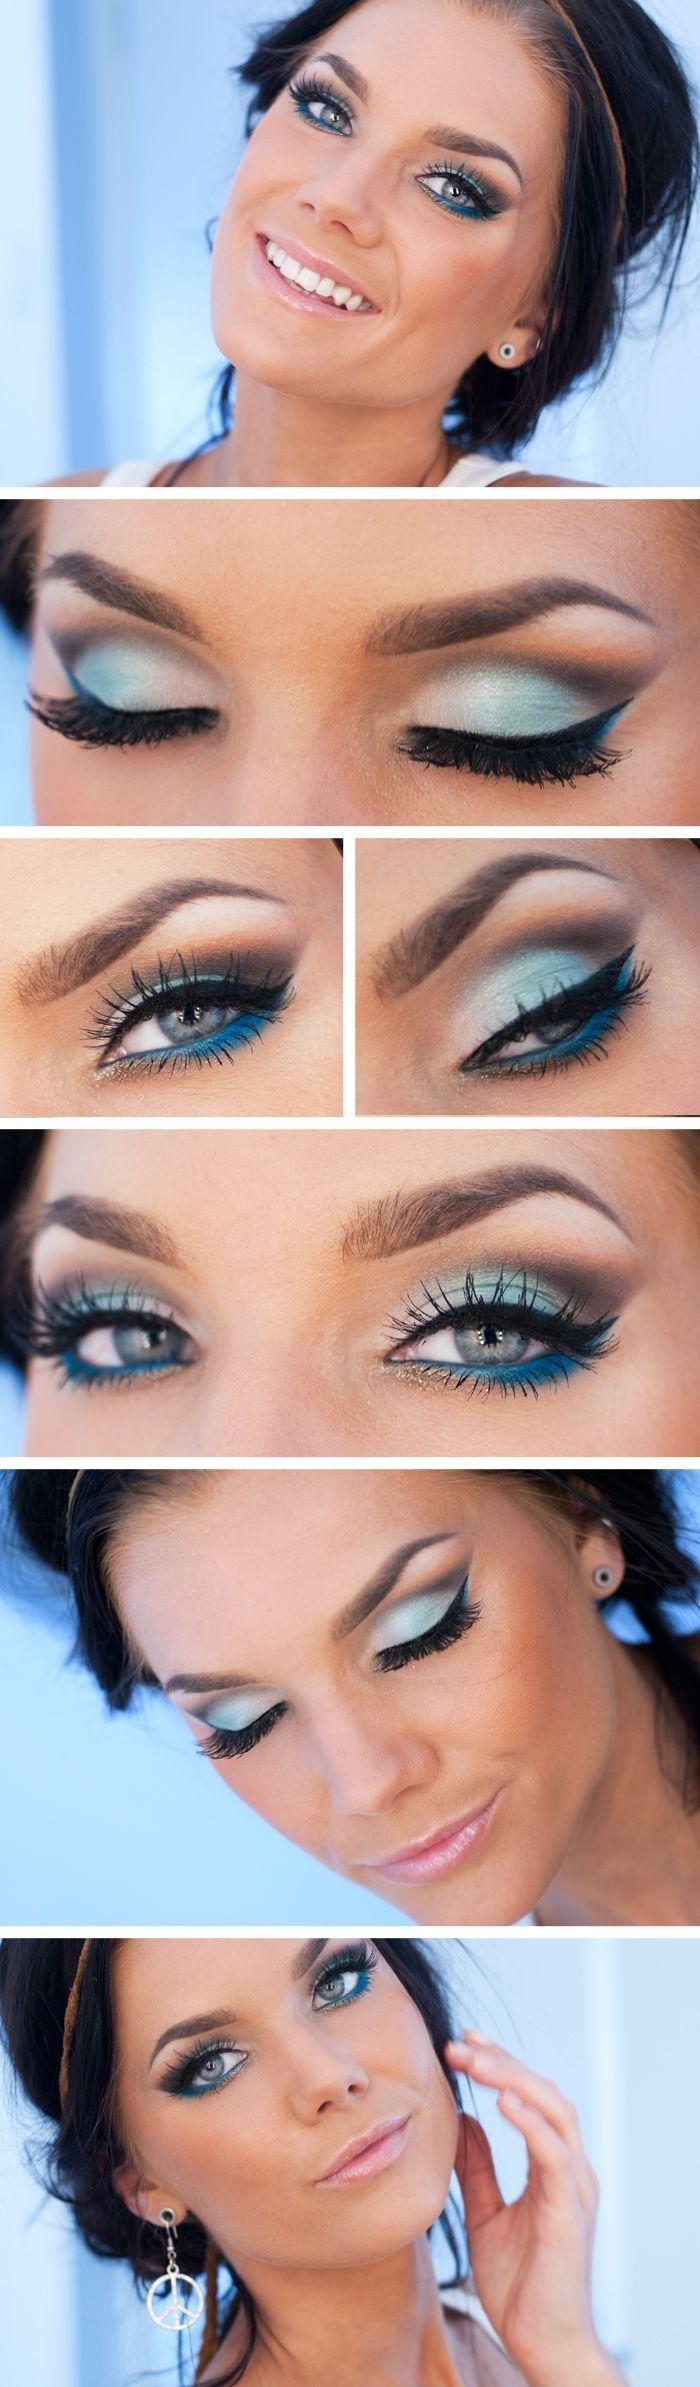 Un beau maquillage bleu d'été